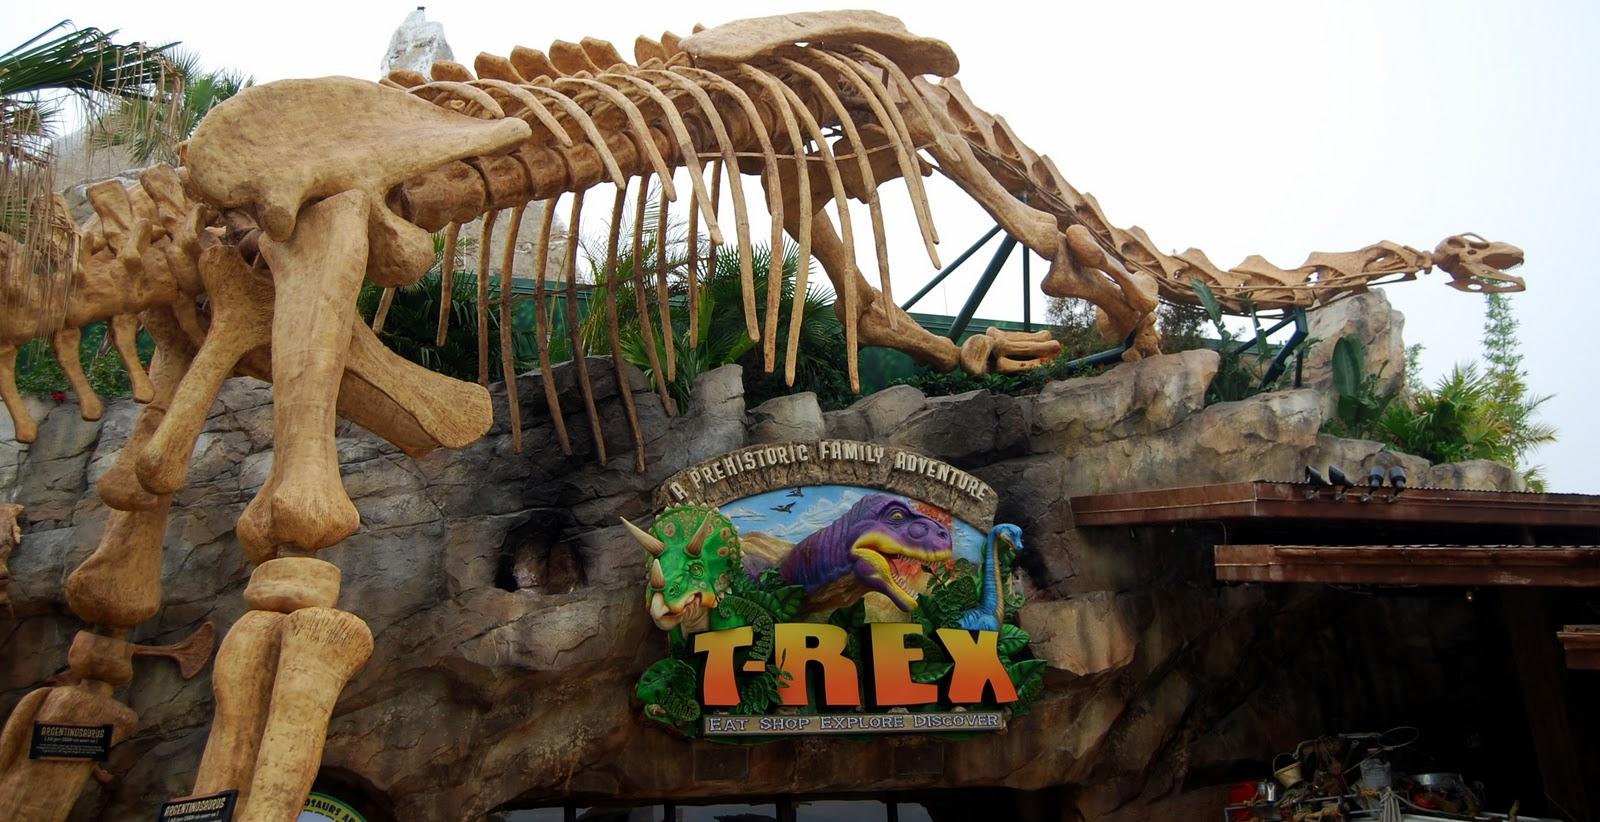 Whole food market wallmart t rex viajesdekabuki for Disney dining reservations t rex